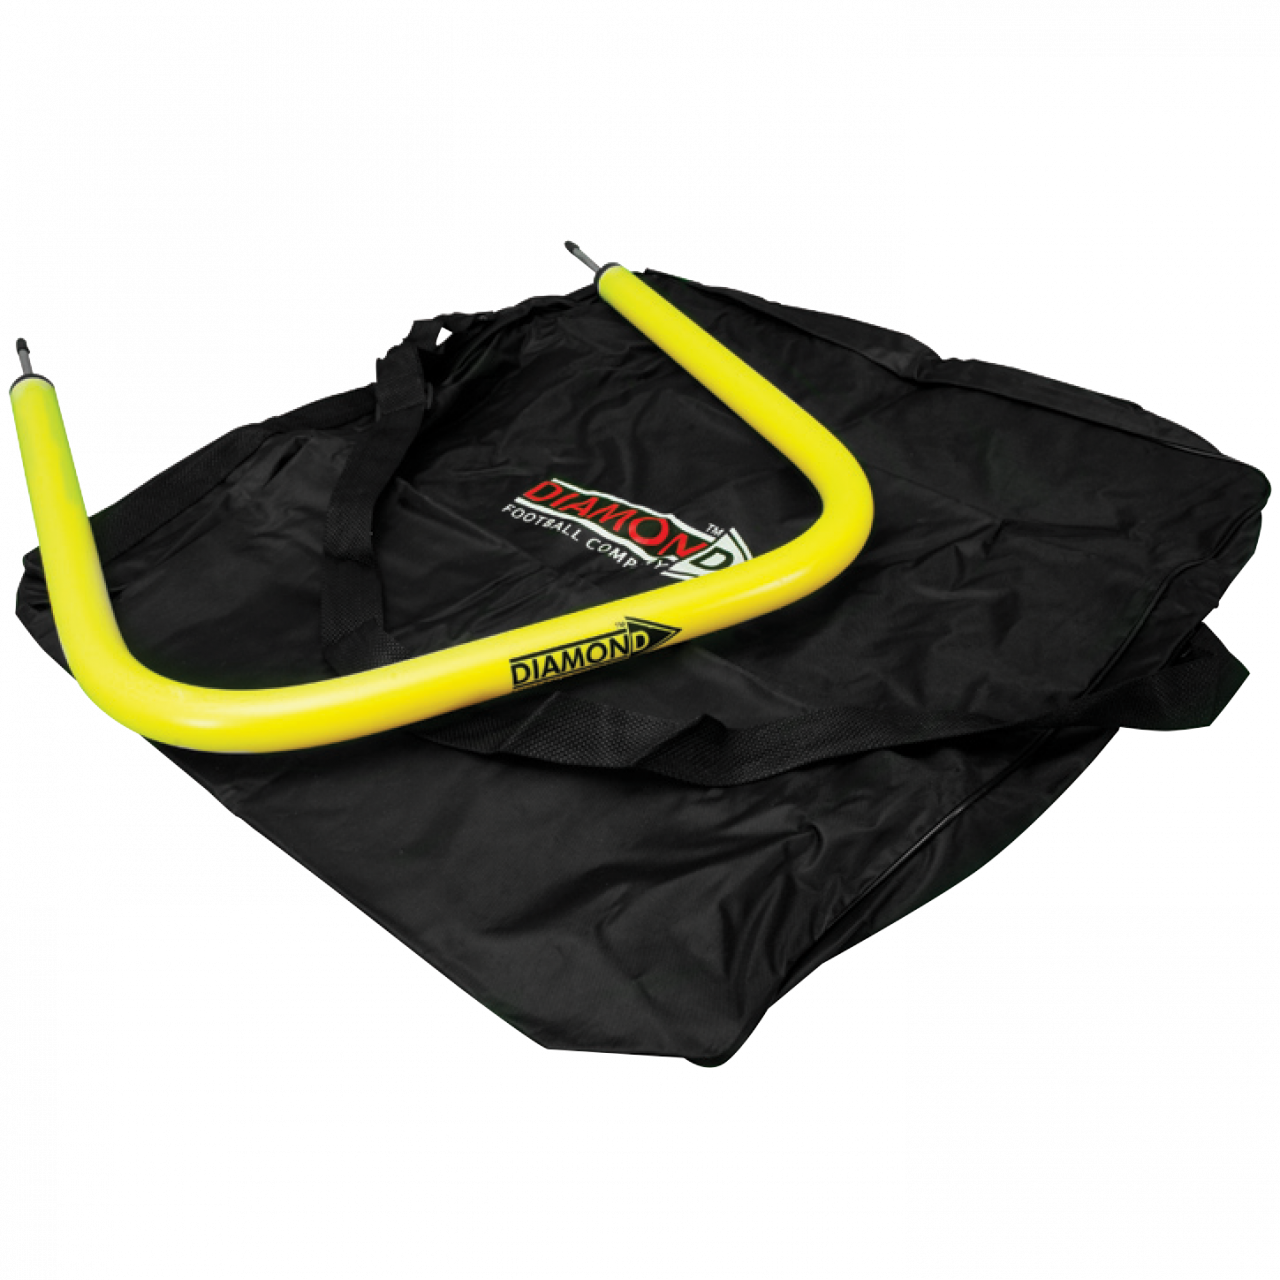 Passing Arc Bag | Diamond Soccer Passing Arc Equipment